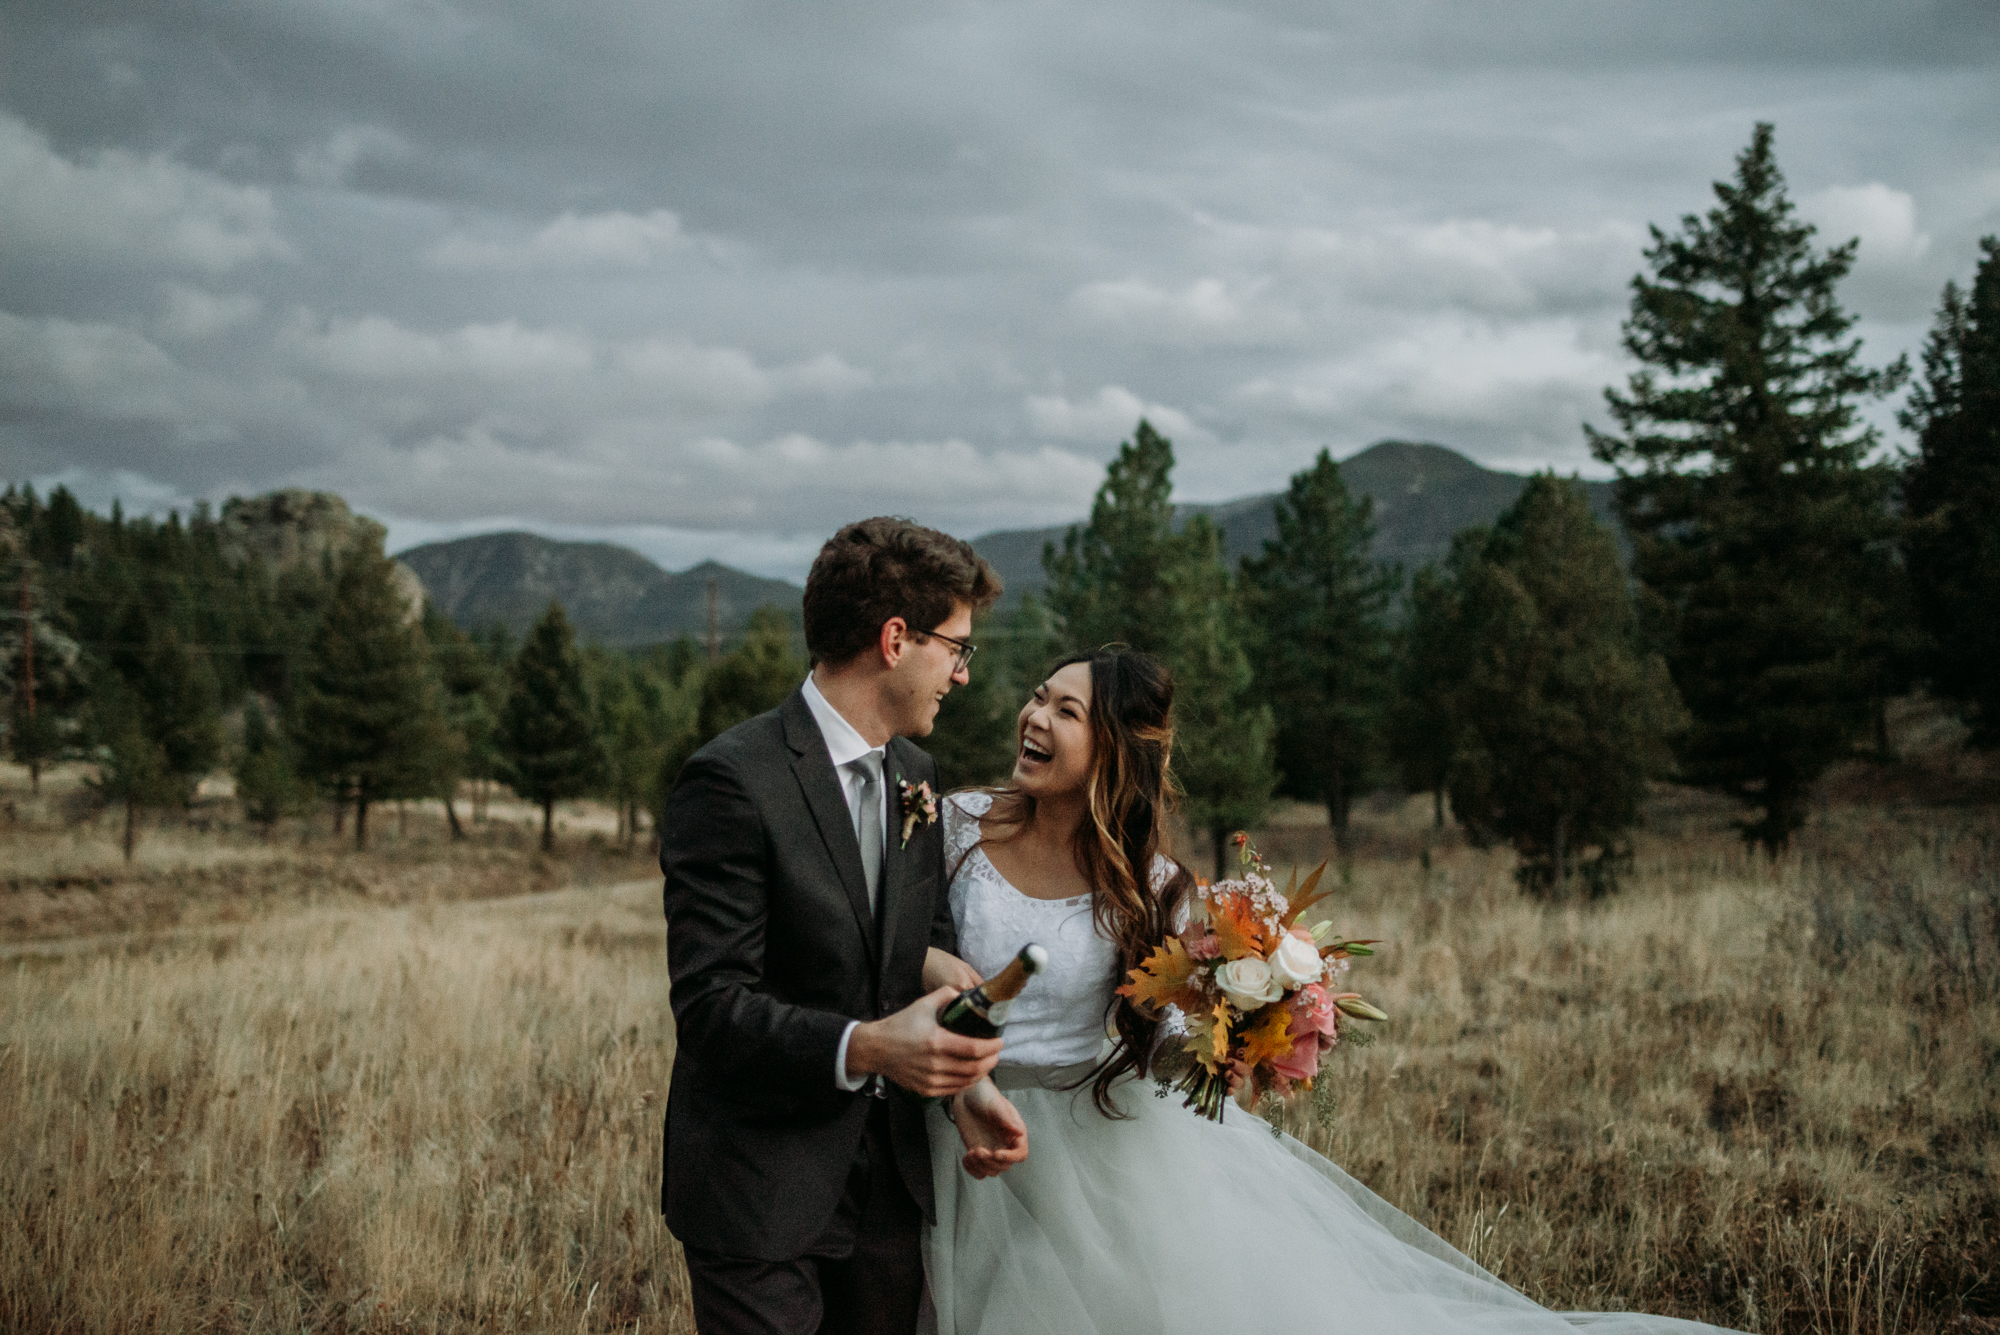 wild_earth_weddings_colorado_elopement_photographer_dogs_rocky_mountains-47.jpg